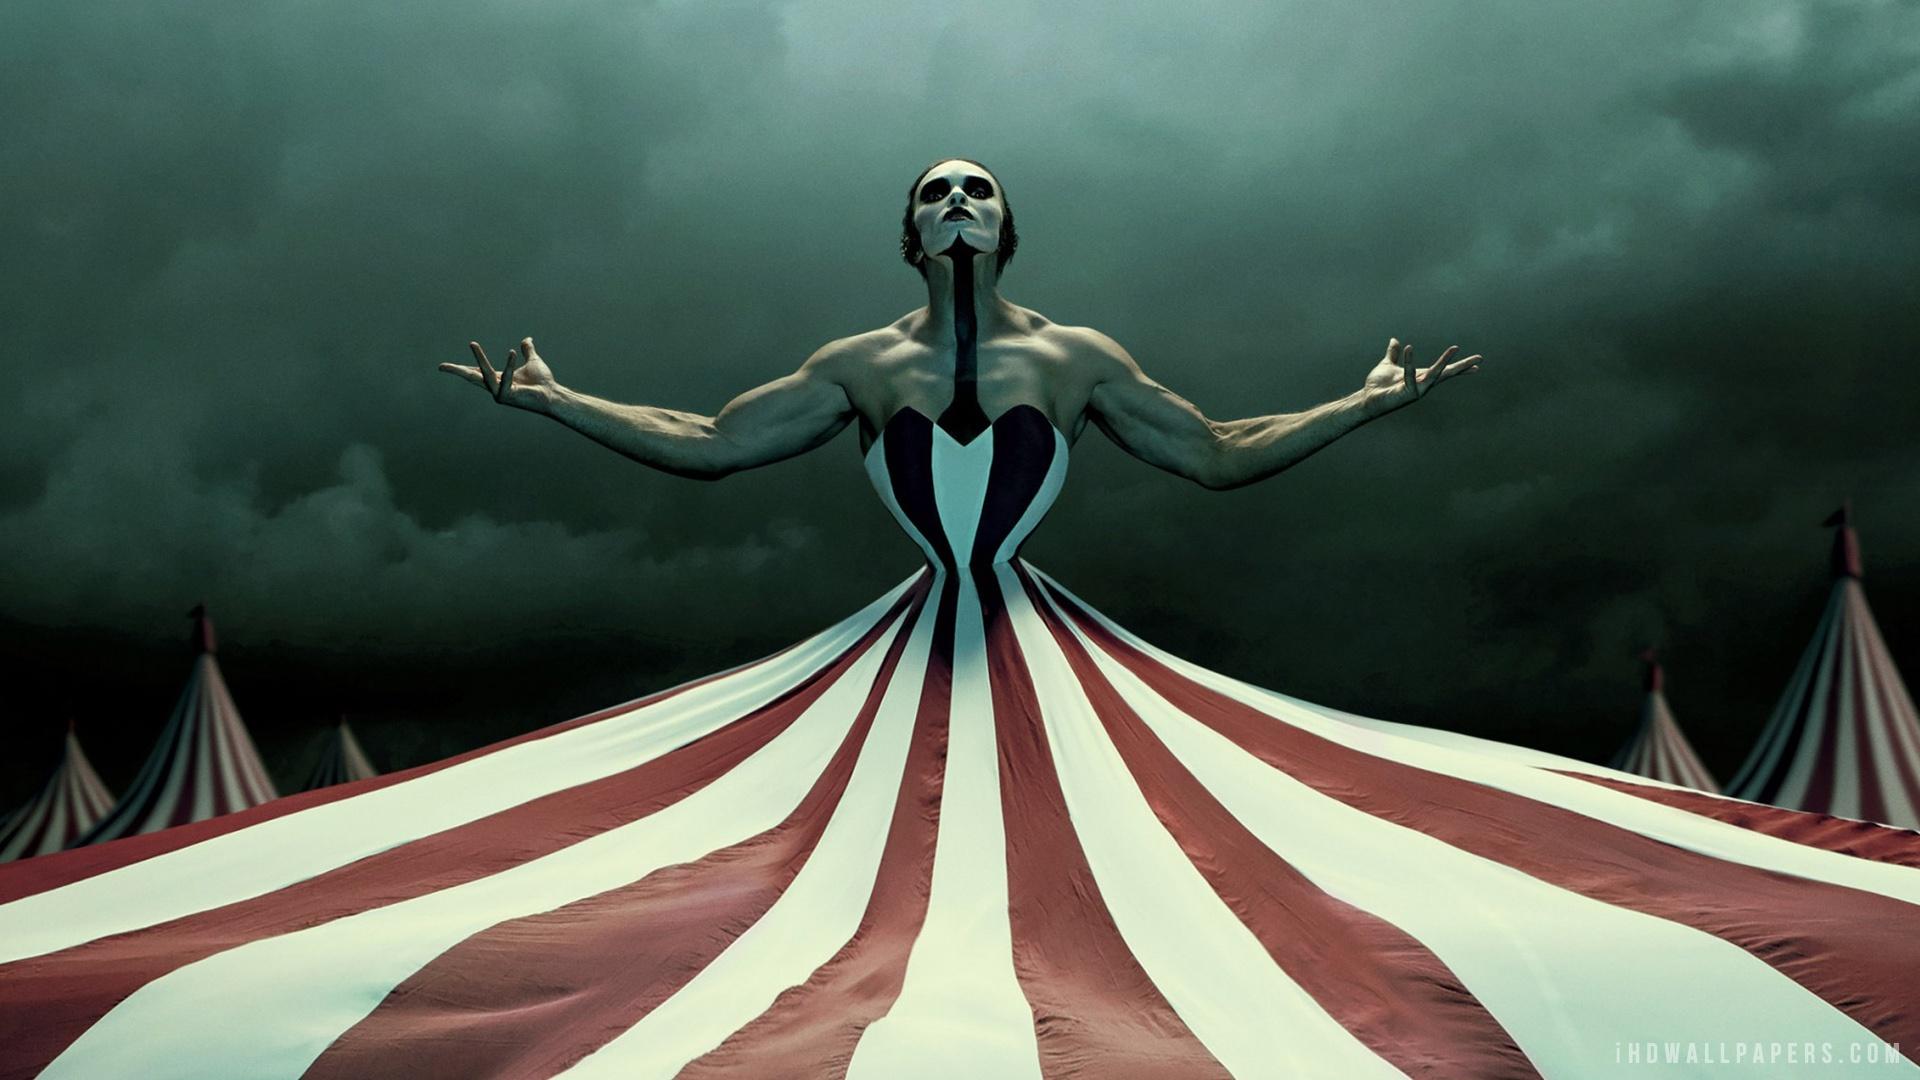 46 American Horror Story Wallpaper Hd On Wallpapersafari